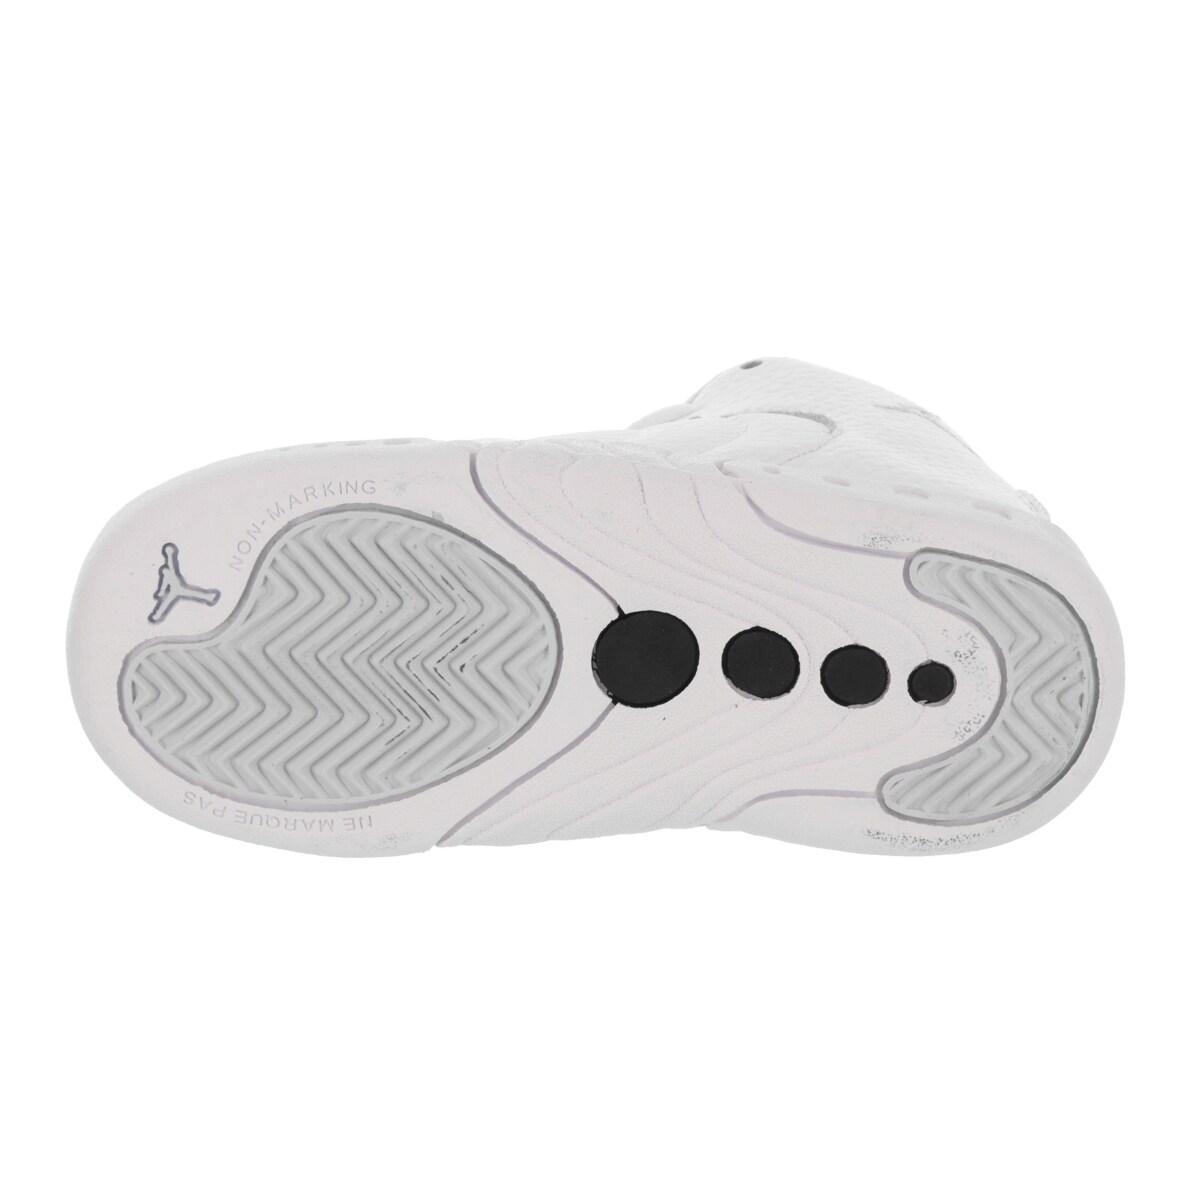 timeless design 31a2e d5ecf Shop Nike Jordan Toddlers Jordan Jumpman Pro BT Basketball Shoe - Free  Shipping Today - Overstock - 17015914